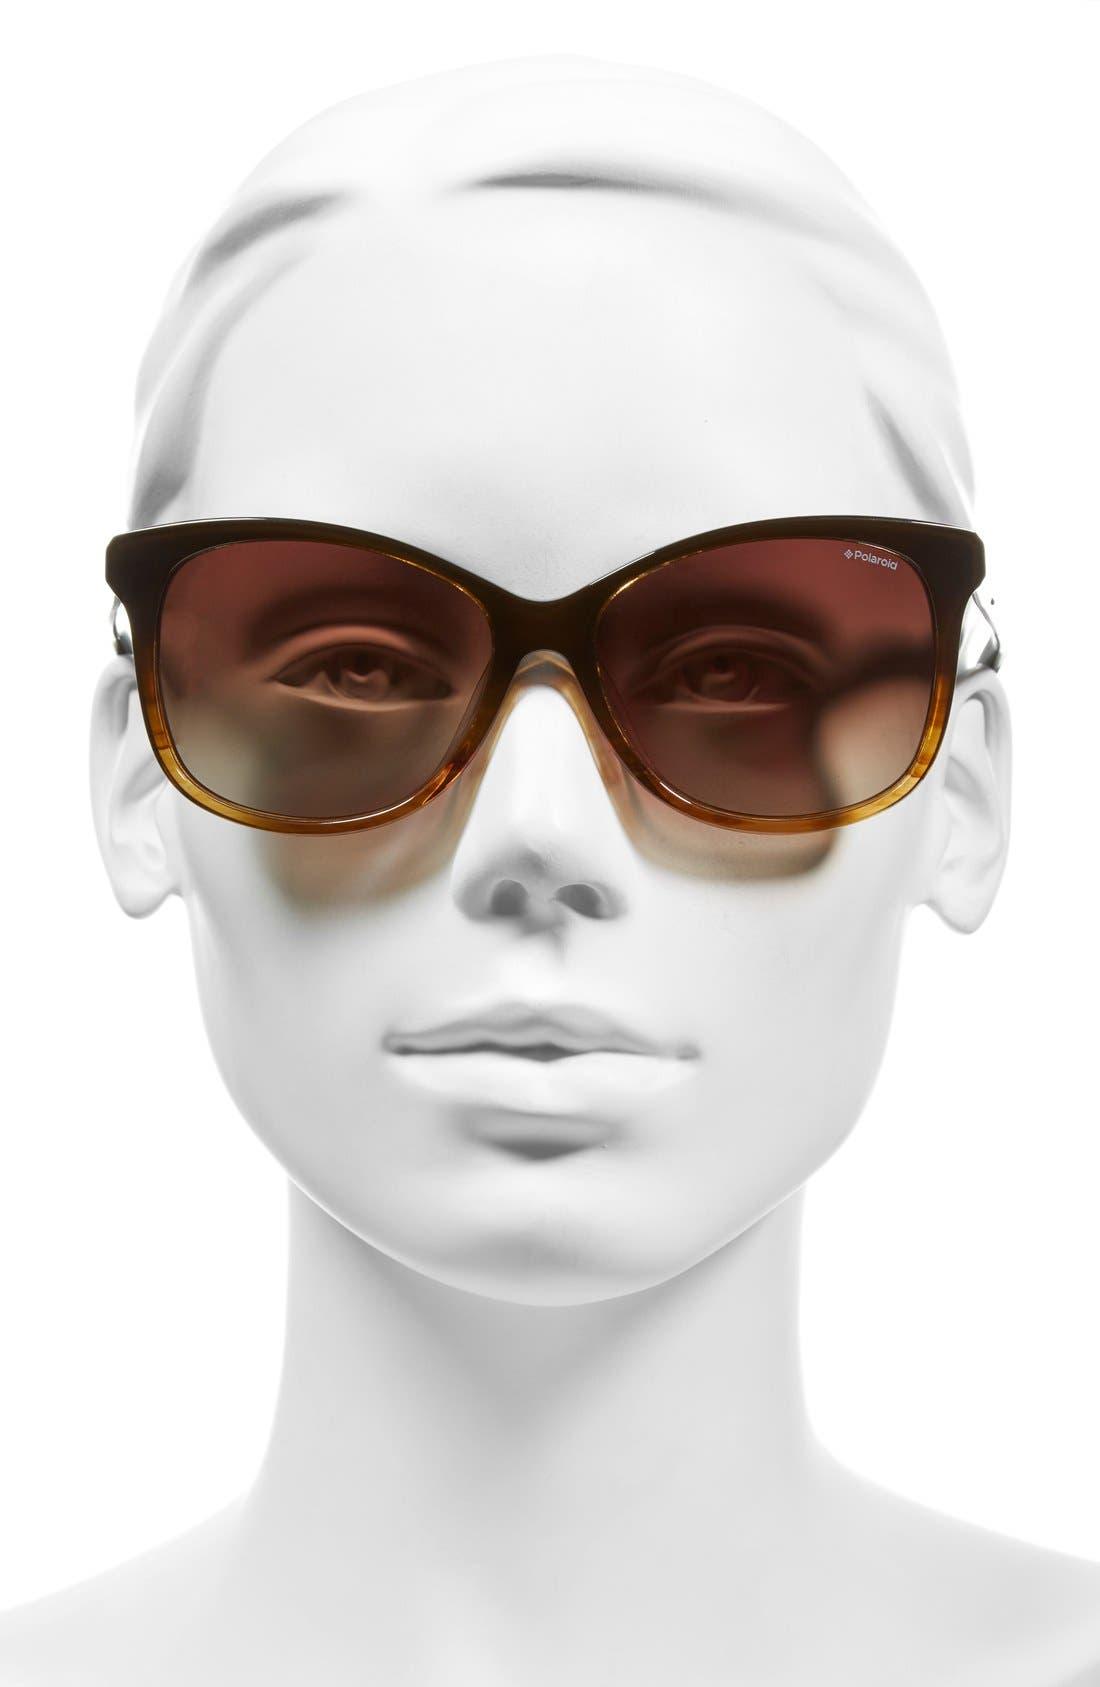 57mm Polarized Cat Eye Sunglasses,                             Alternate thumbnail 2, color,                             200